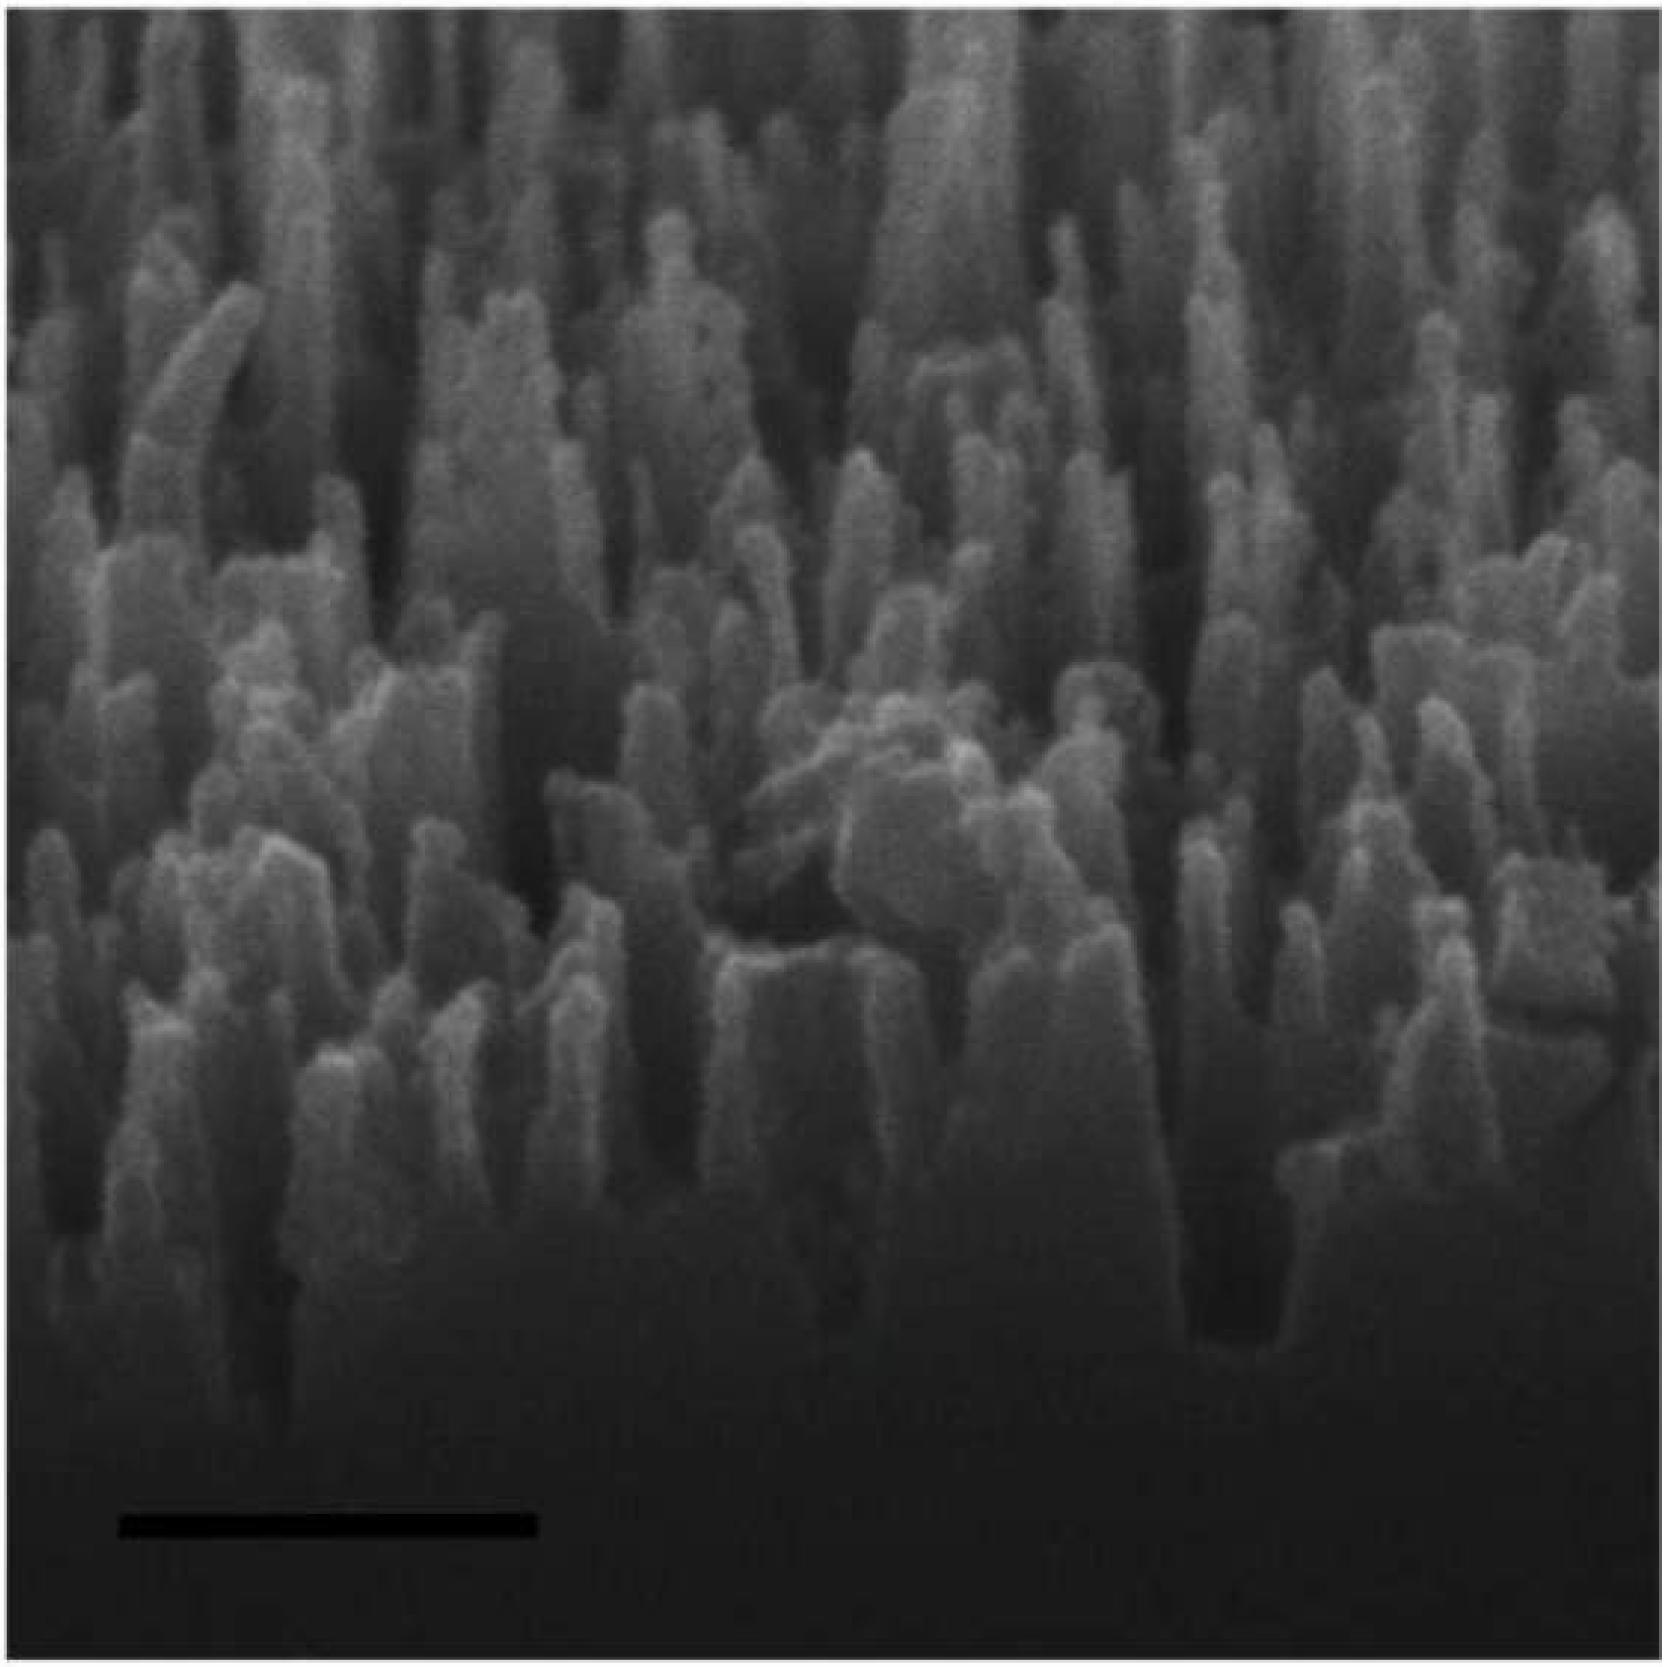 bioabbaubare polymere stants